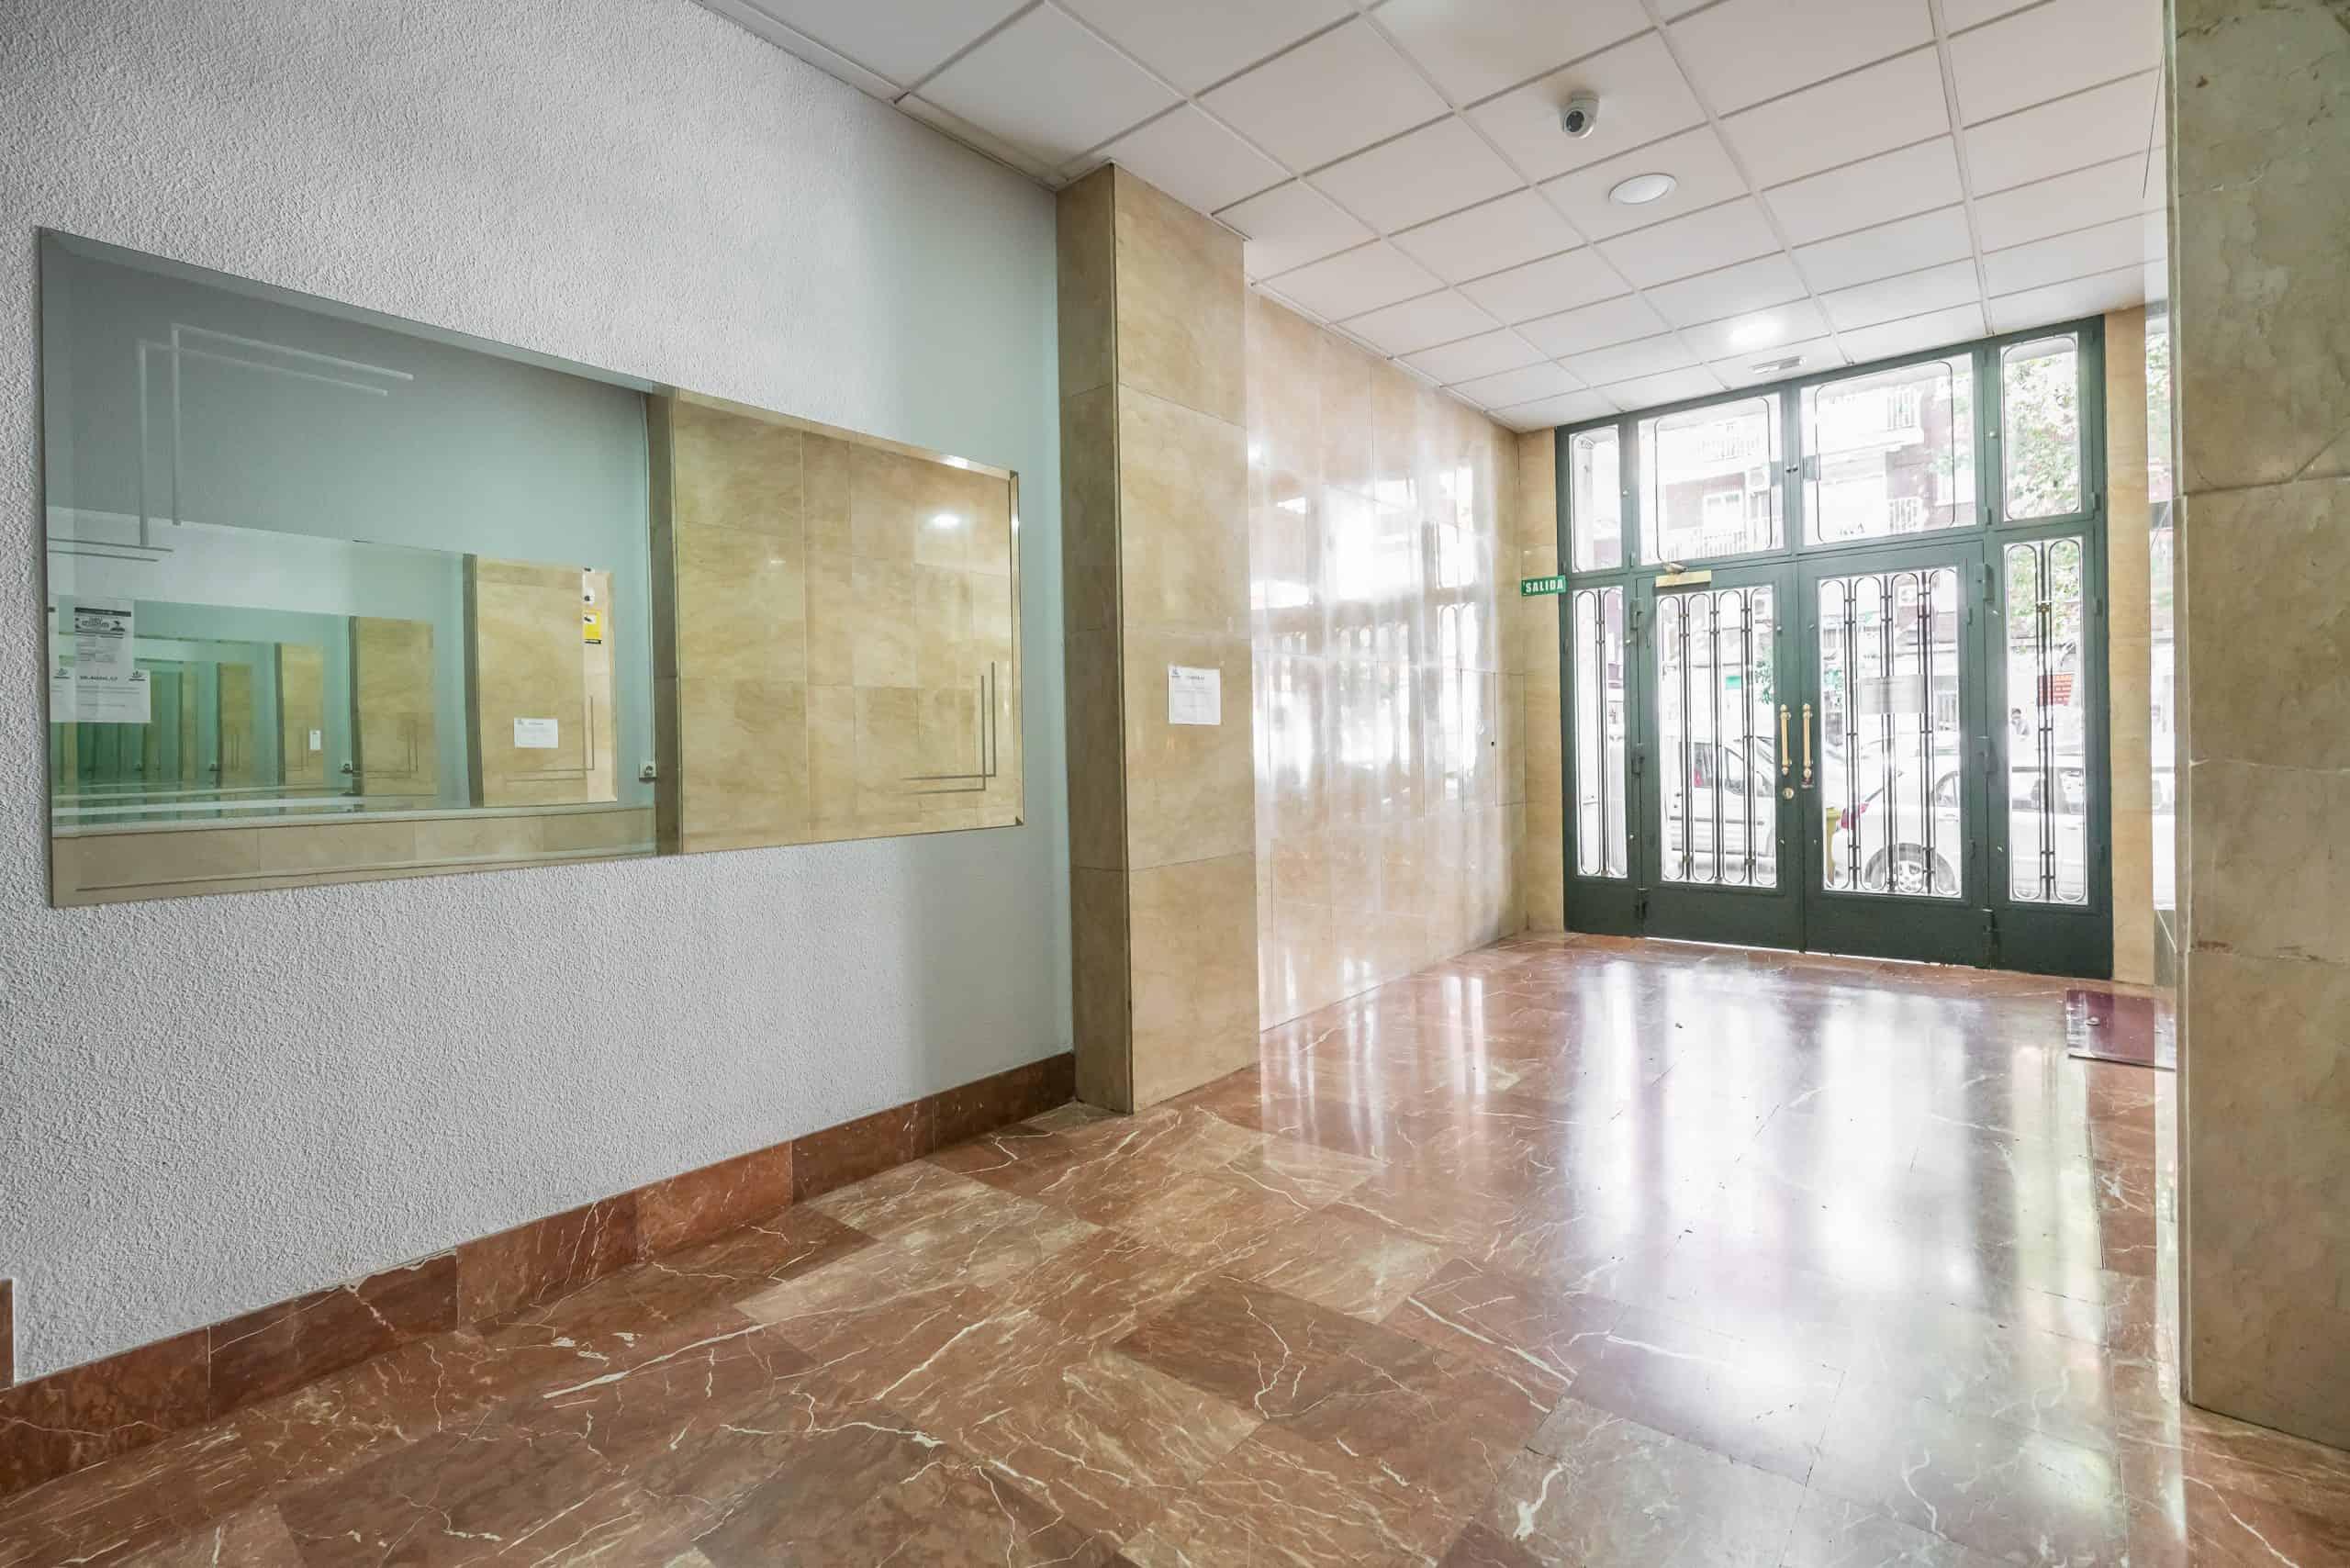 Agencia Inmobiliaria de Madrid-FUTUROCASA-calle Alcala- portal (2)